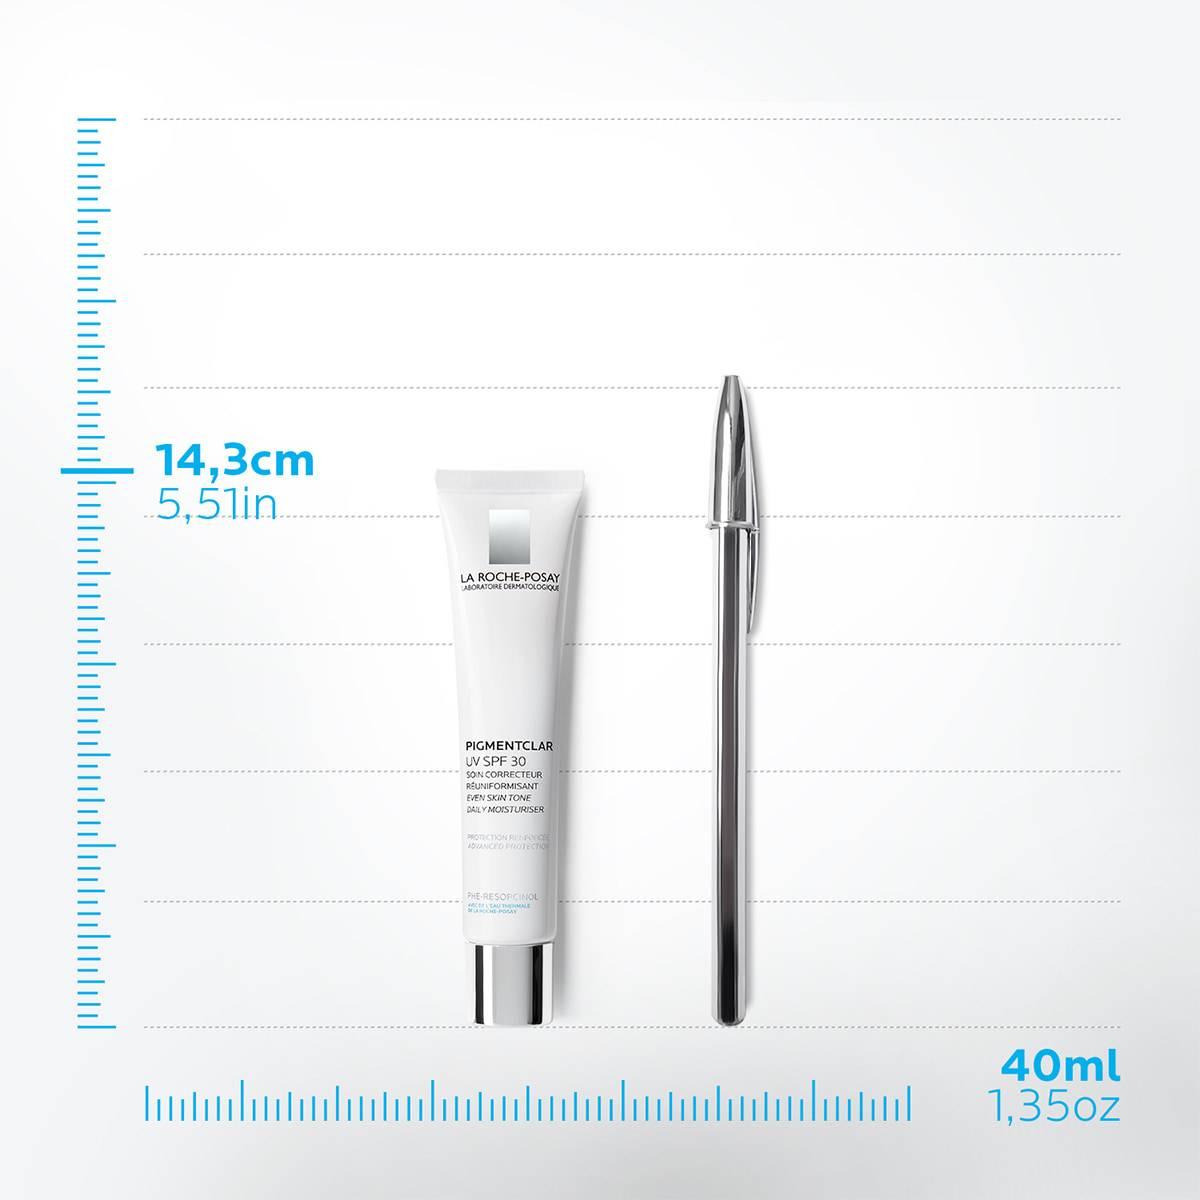 La Roche Posay ProduktSide Anti-Age Pigmentclar UV Spf30 fugtighedscreme